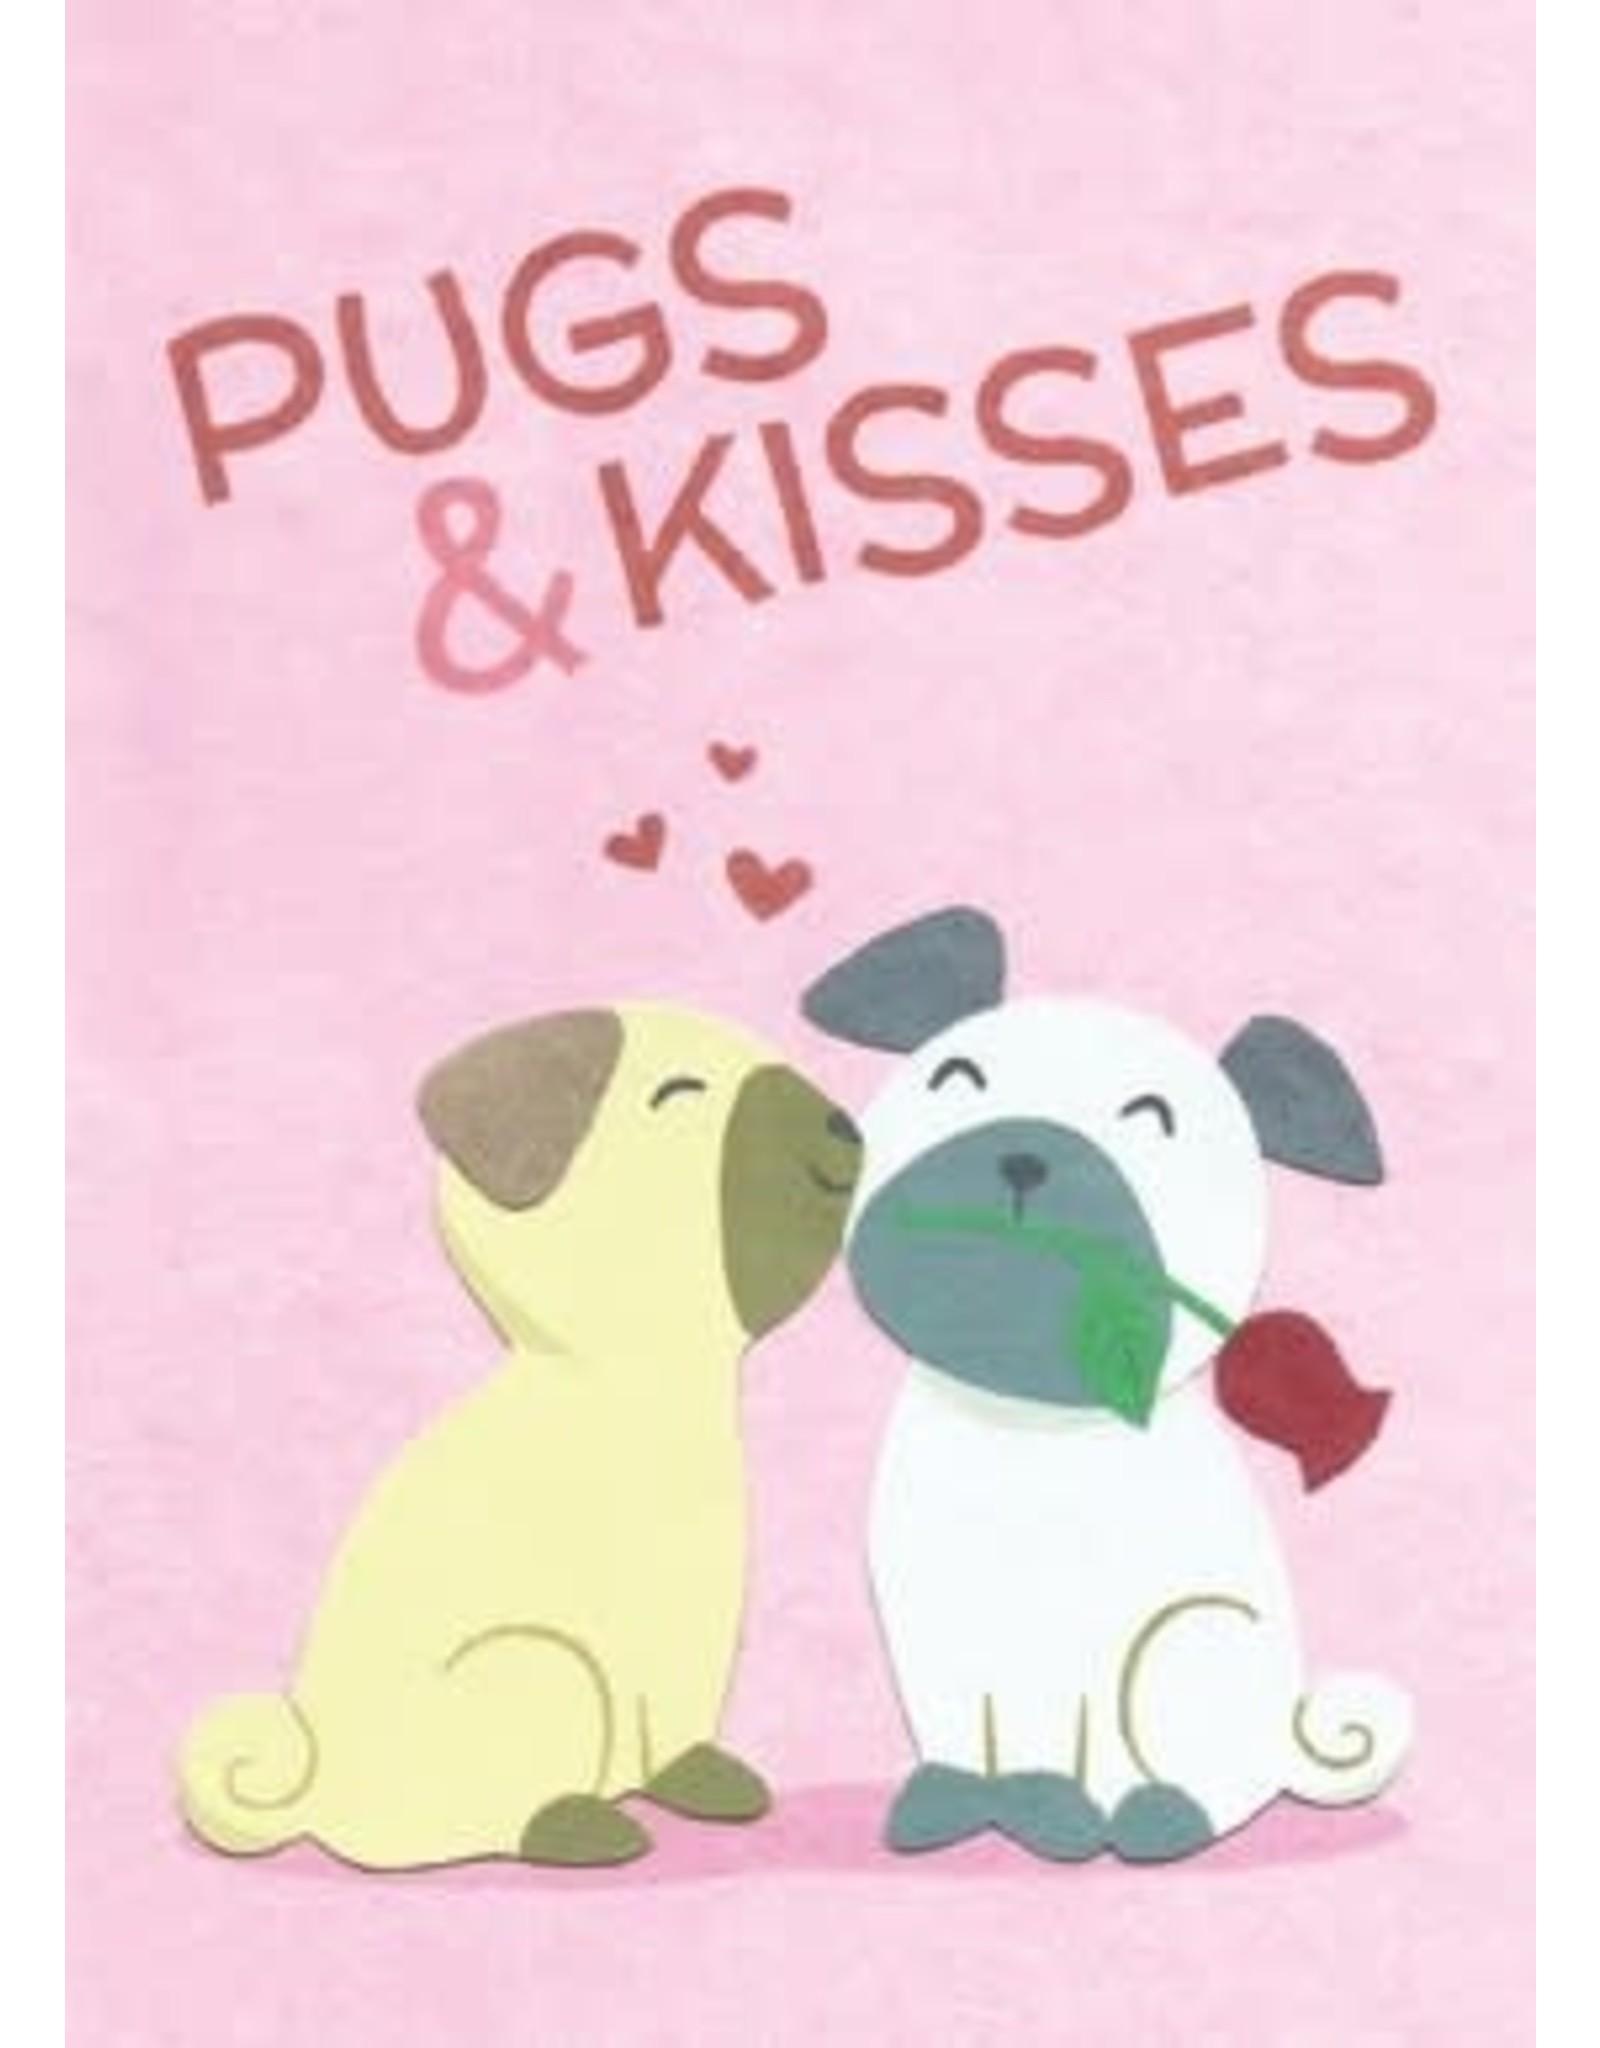 Pugs and Kisses Love Greeting Card, Rwanda